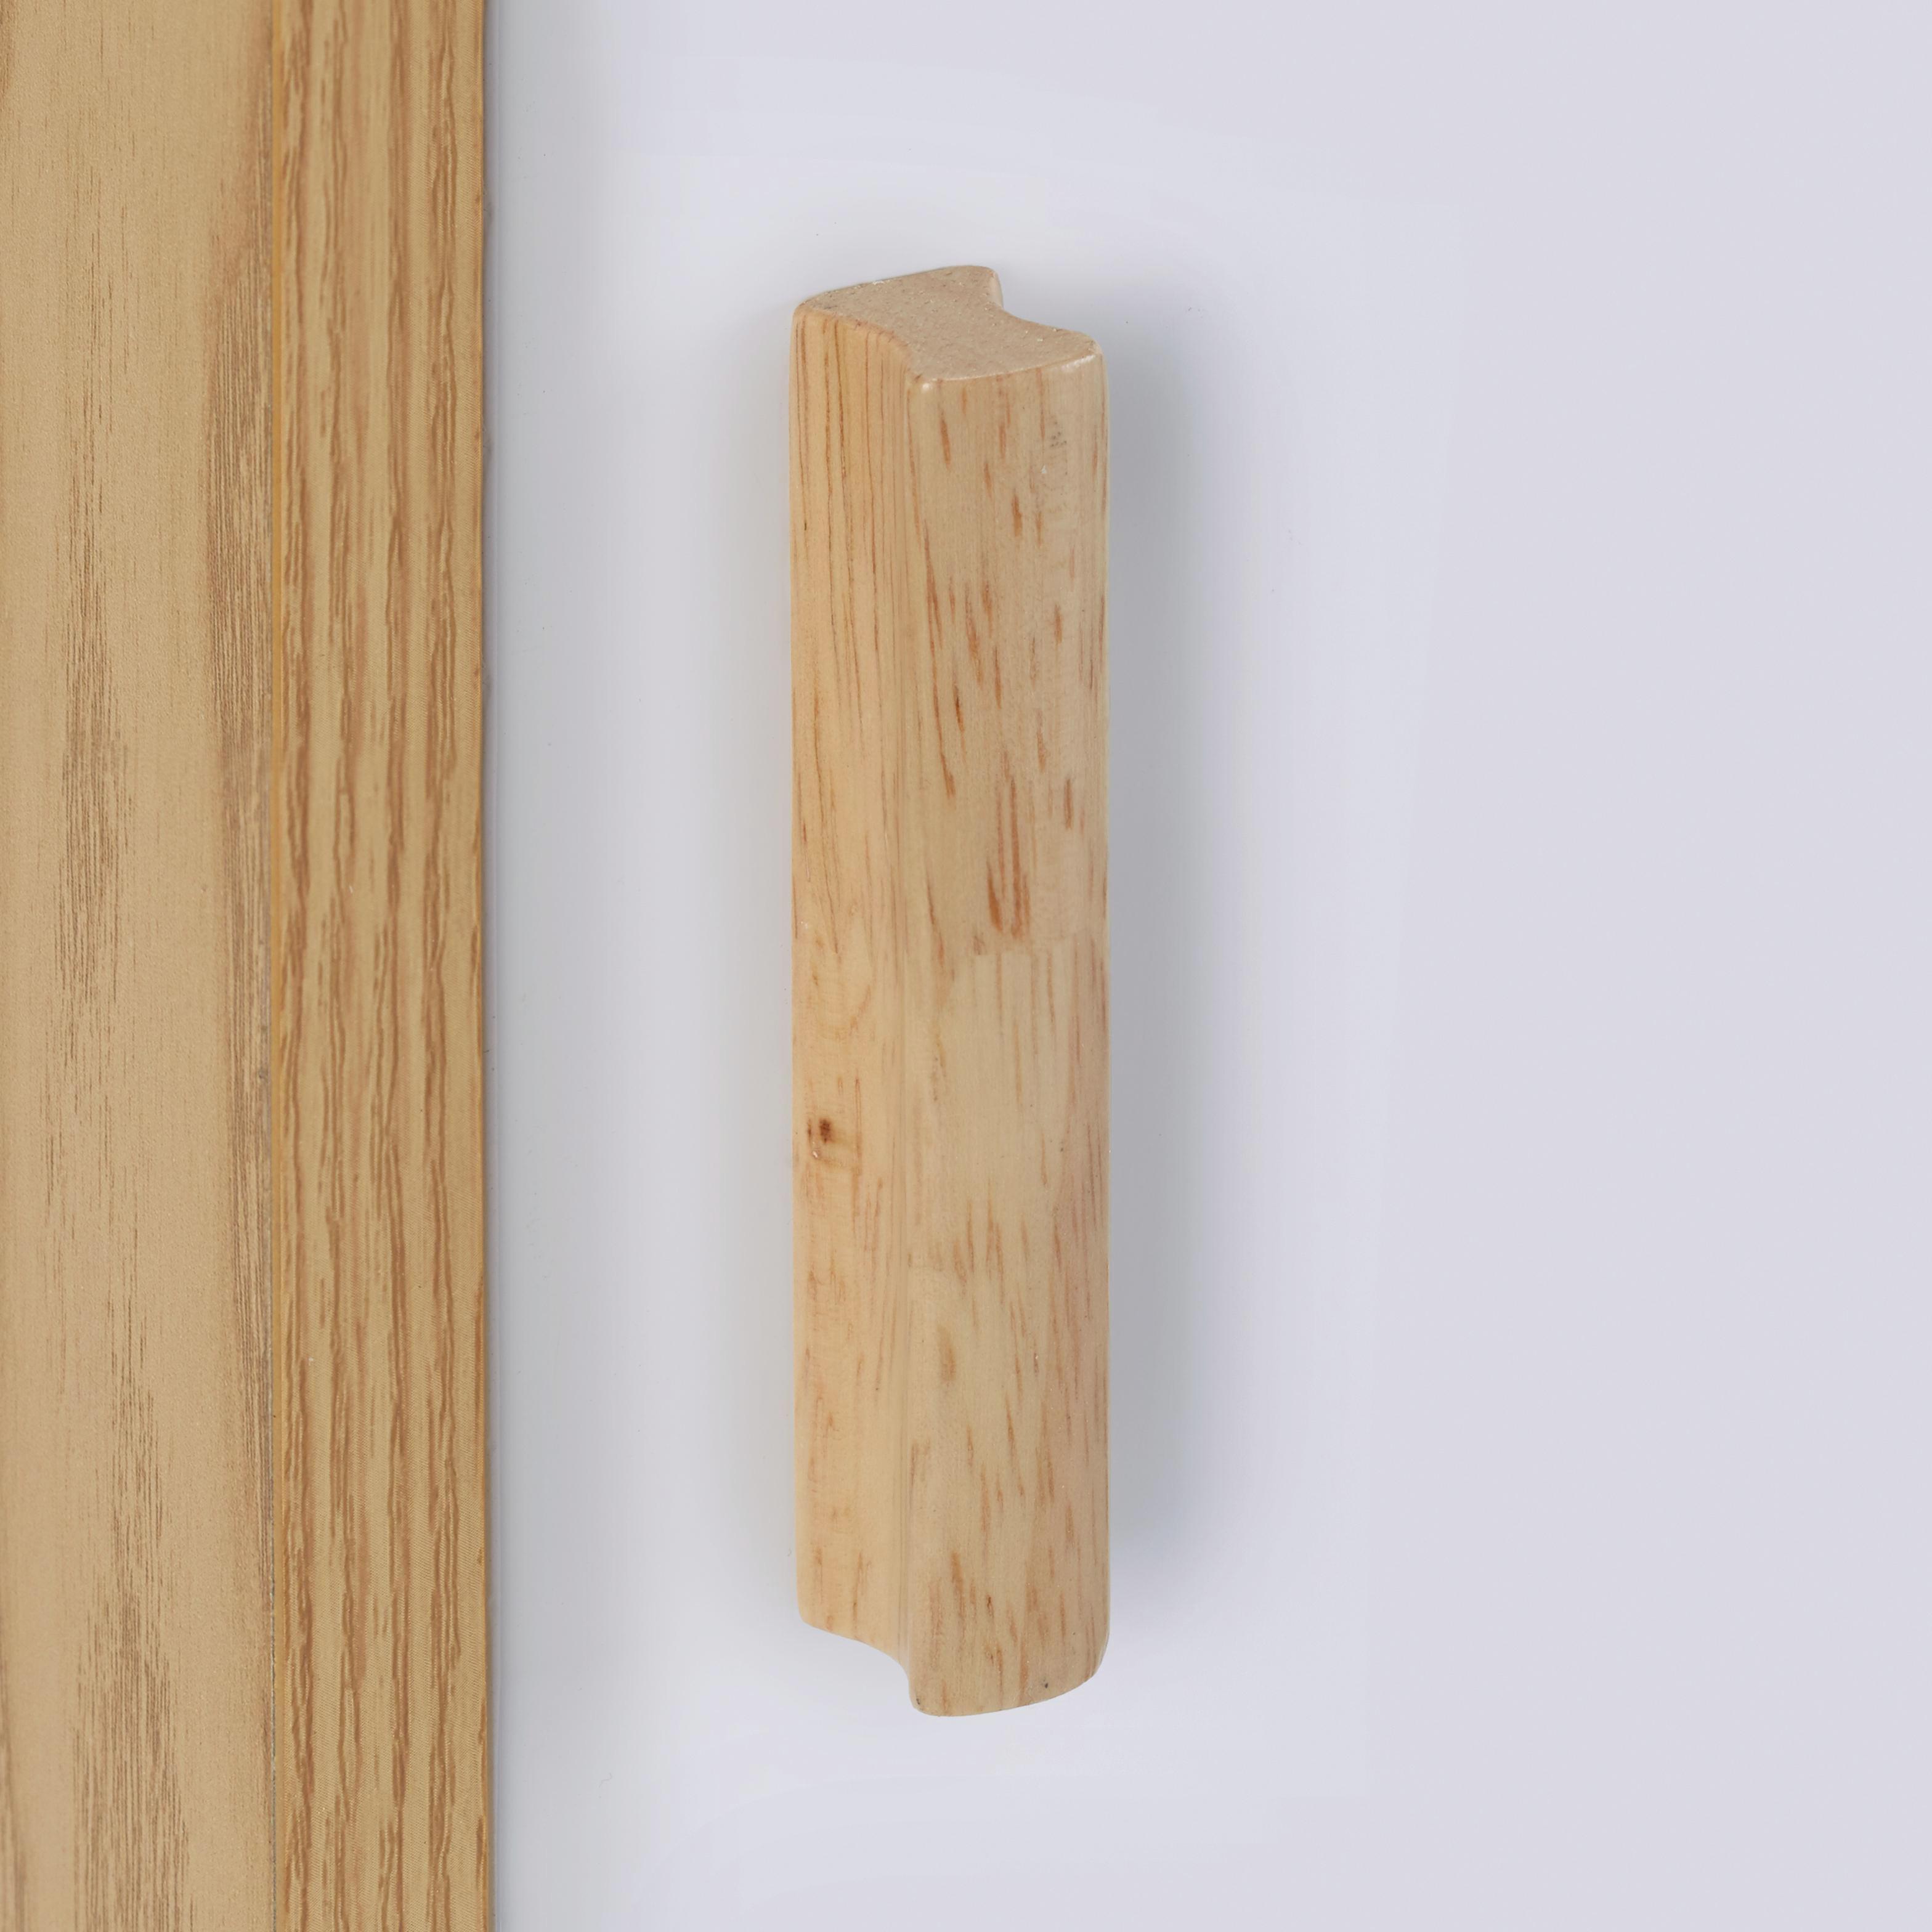 TV-Element Aliona - Eschefarben/Weiß, MODERN, Holz (120/50/40cm) - MODERN LIVING